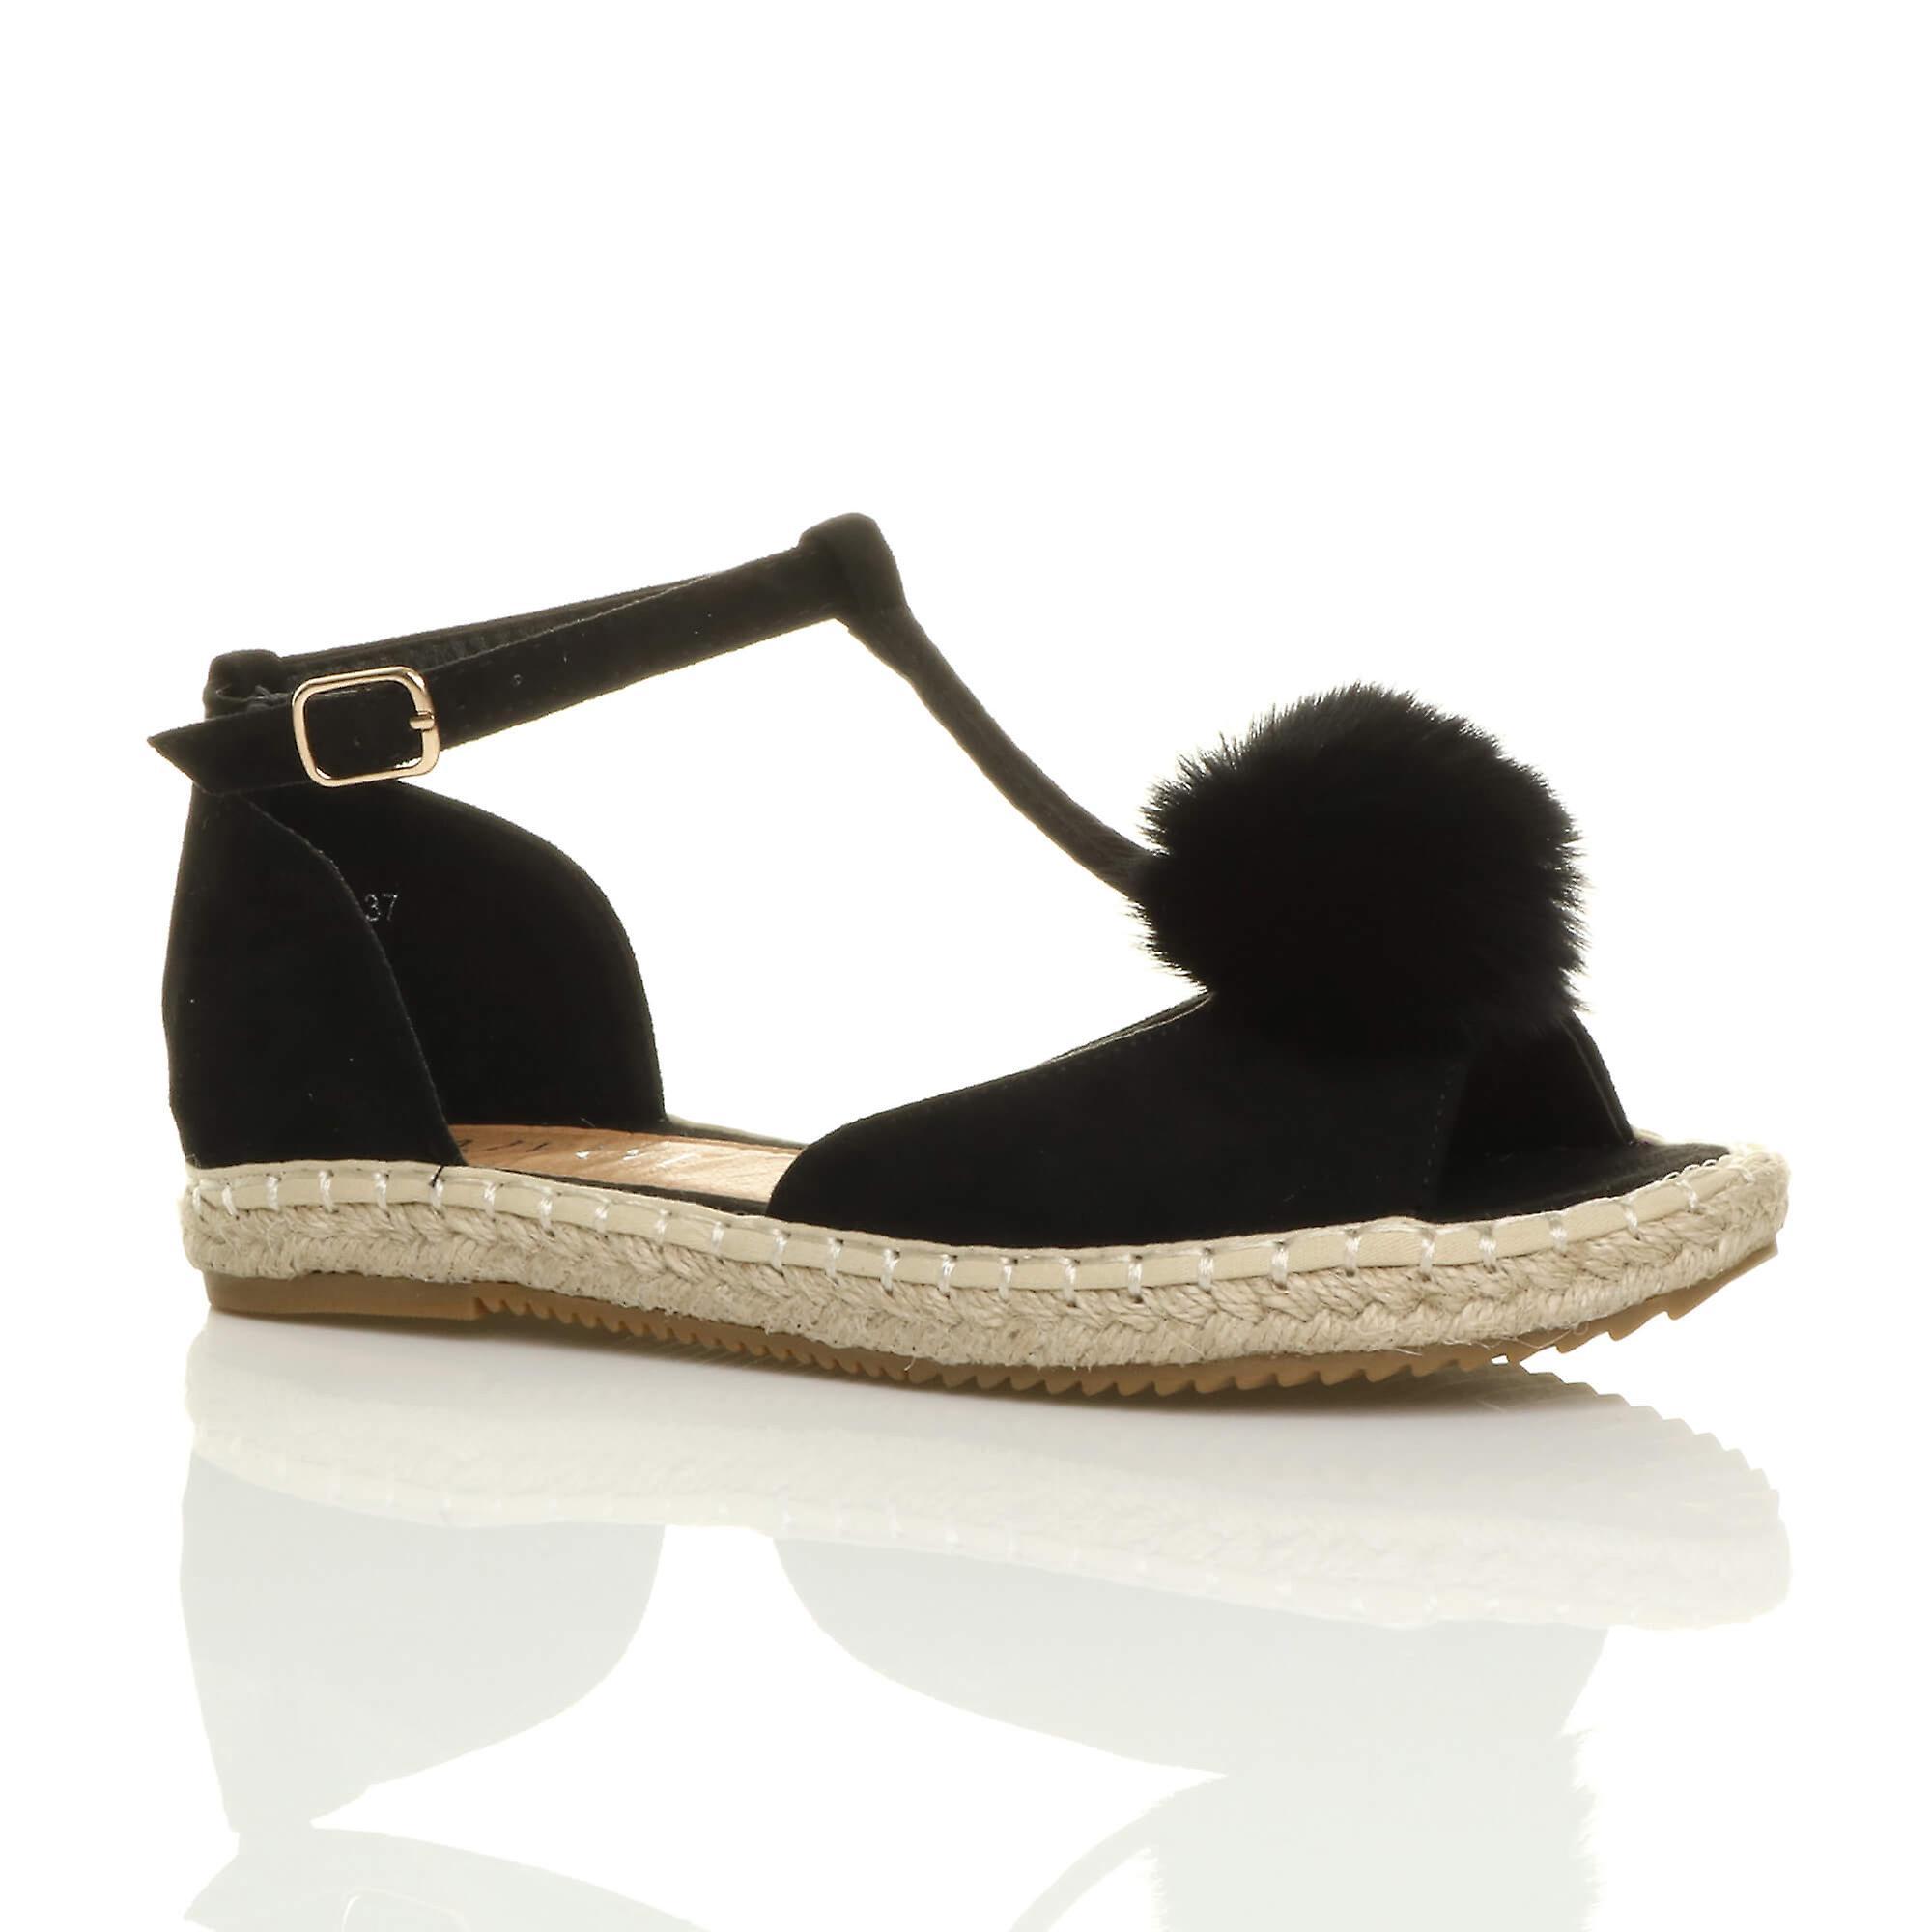 Ajvani womens flat t-bar pom pom buckle peep toe shoes espadrilles sandals A8I54